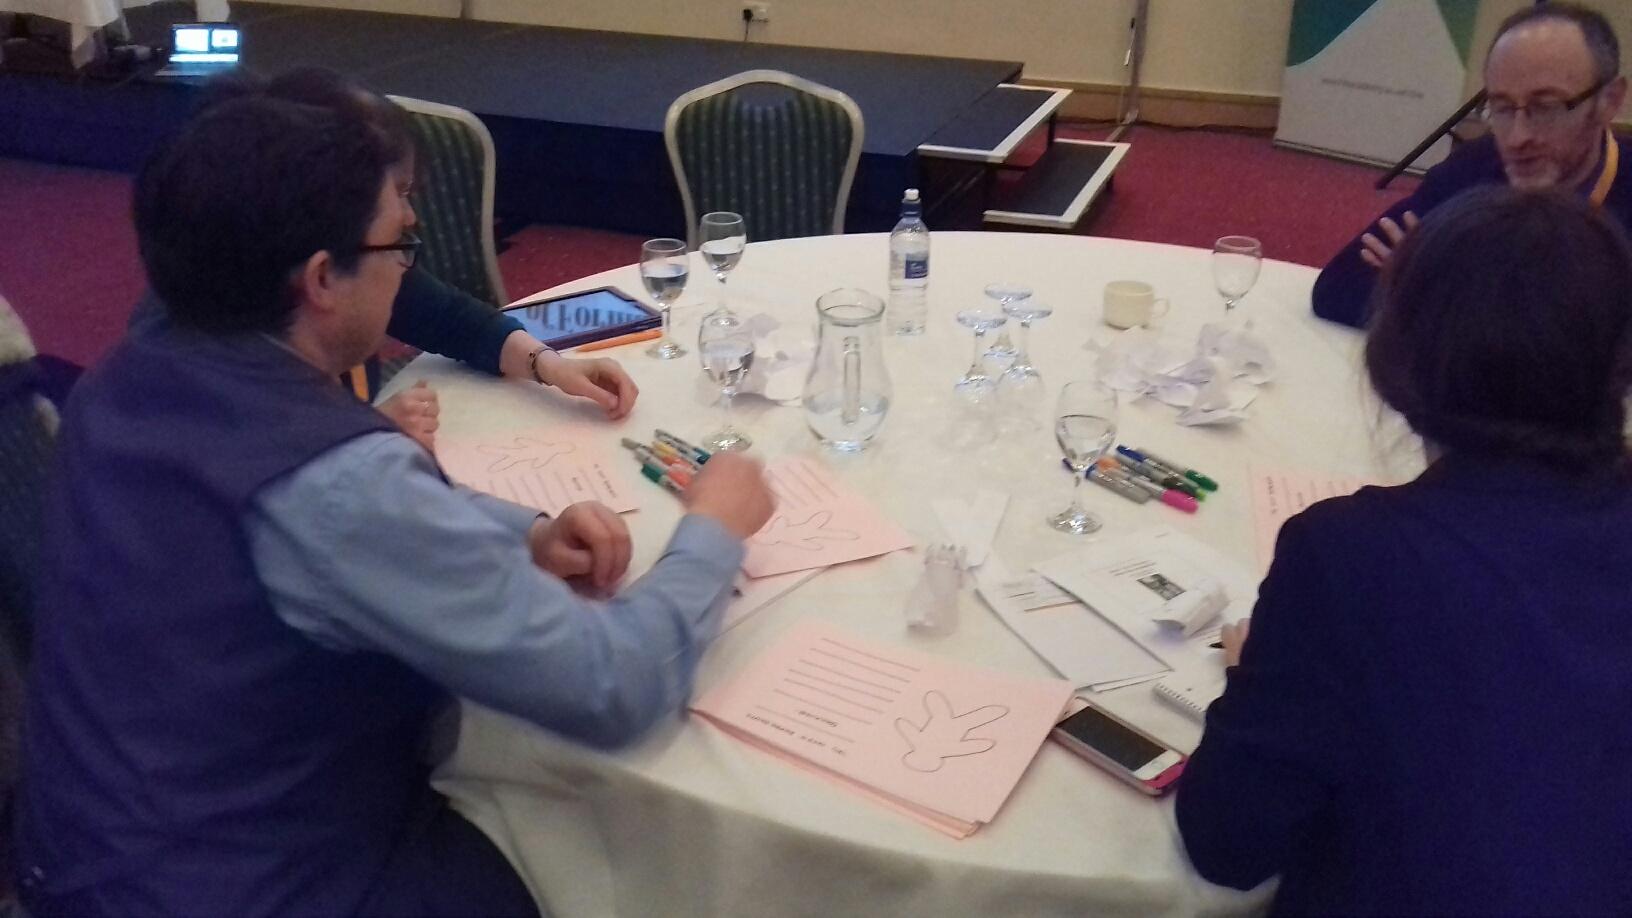 Participants get creative...